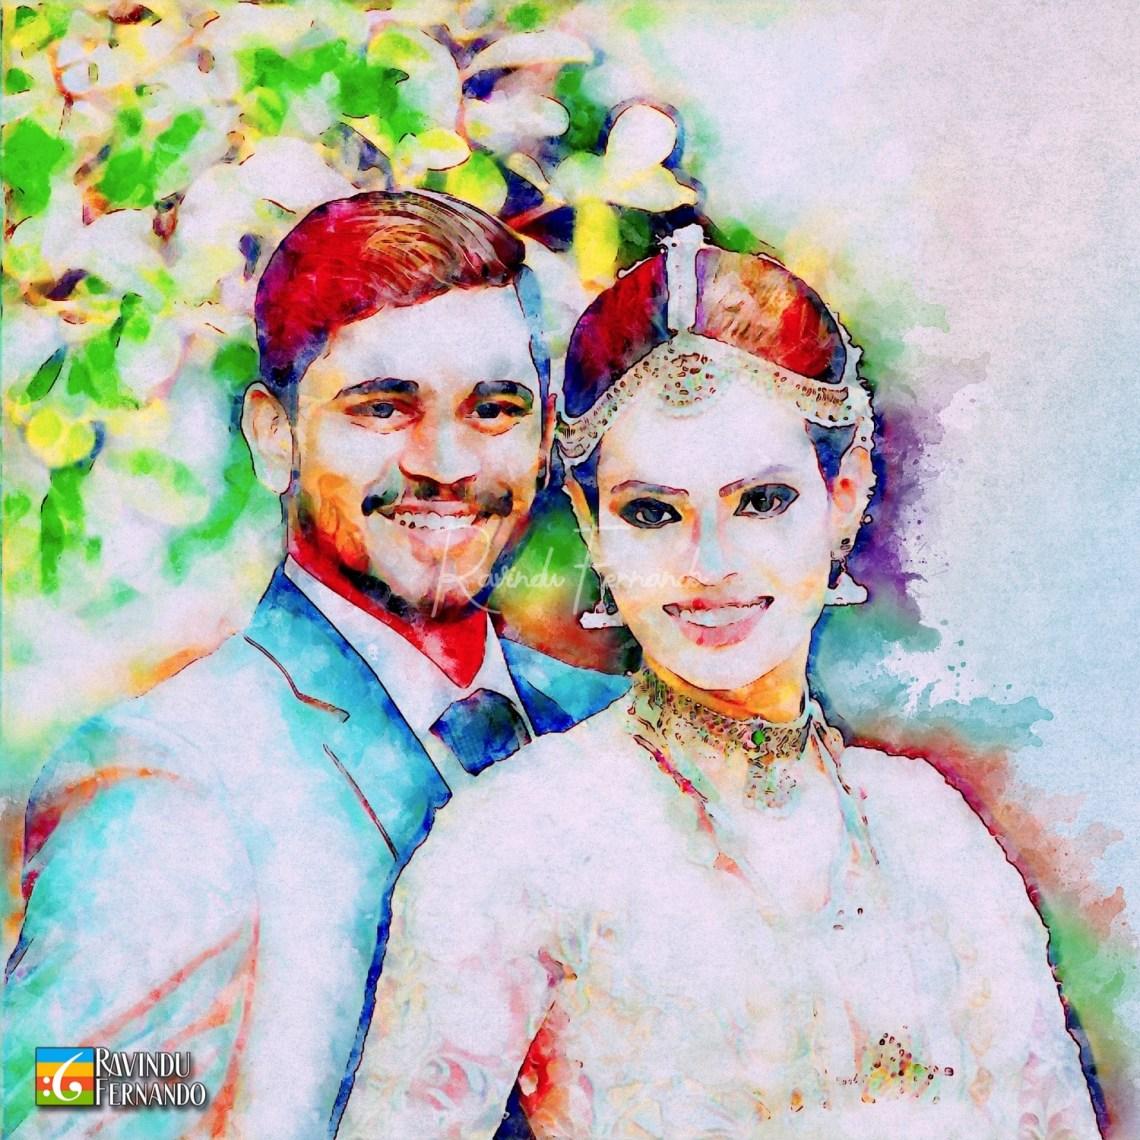 Wedding Couple - Digital Watercolor Painting